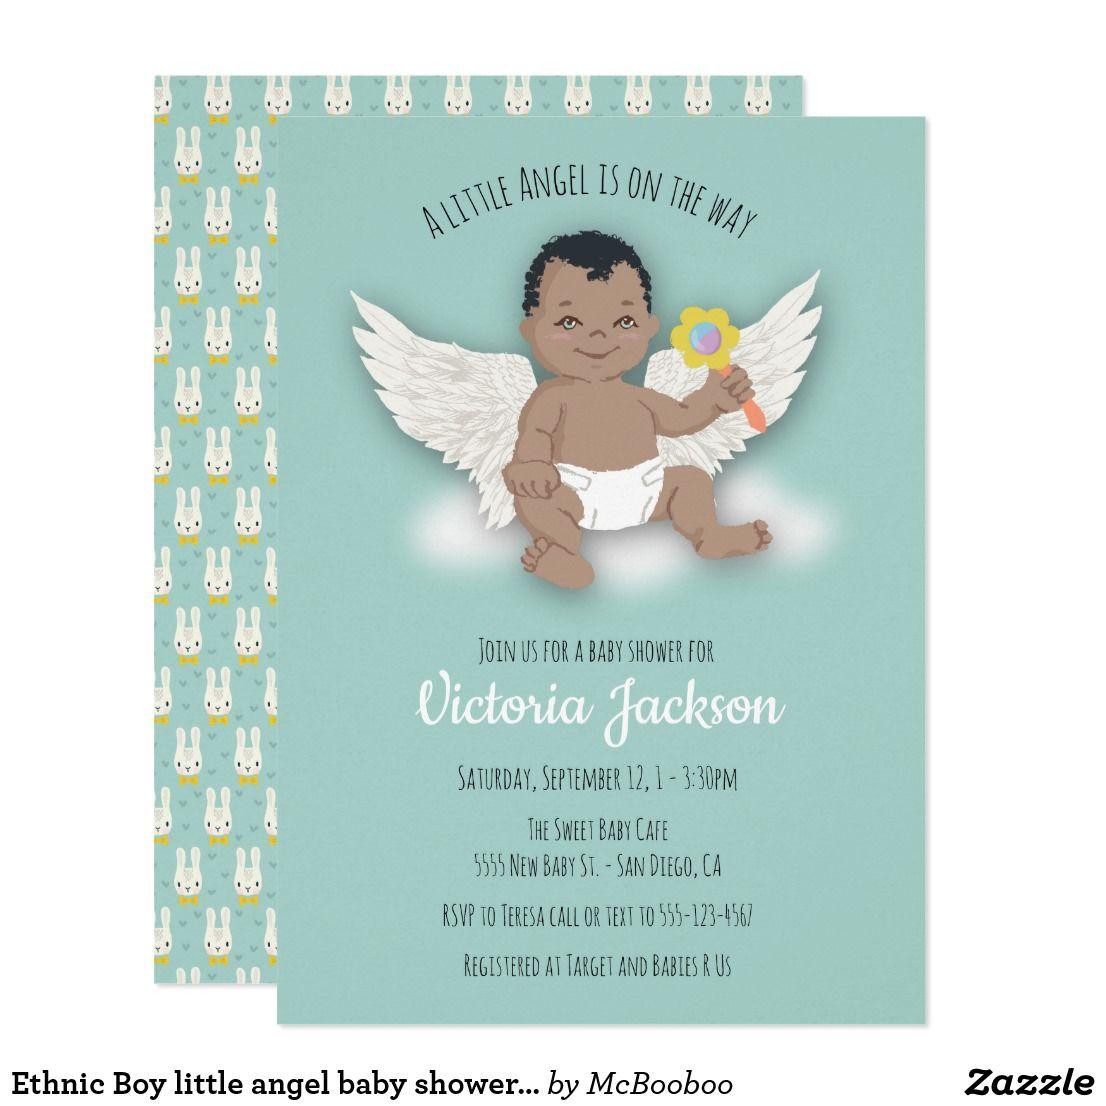 Ethnic Boy little angel baby shower invitations